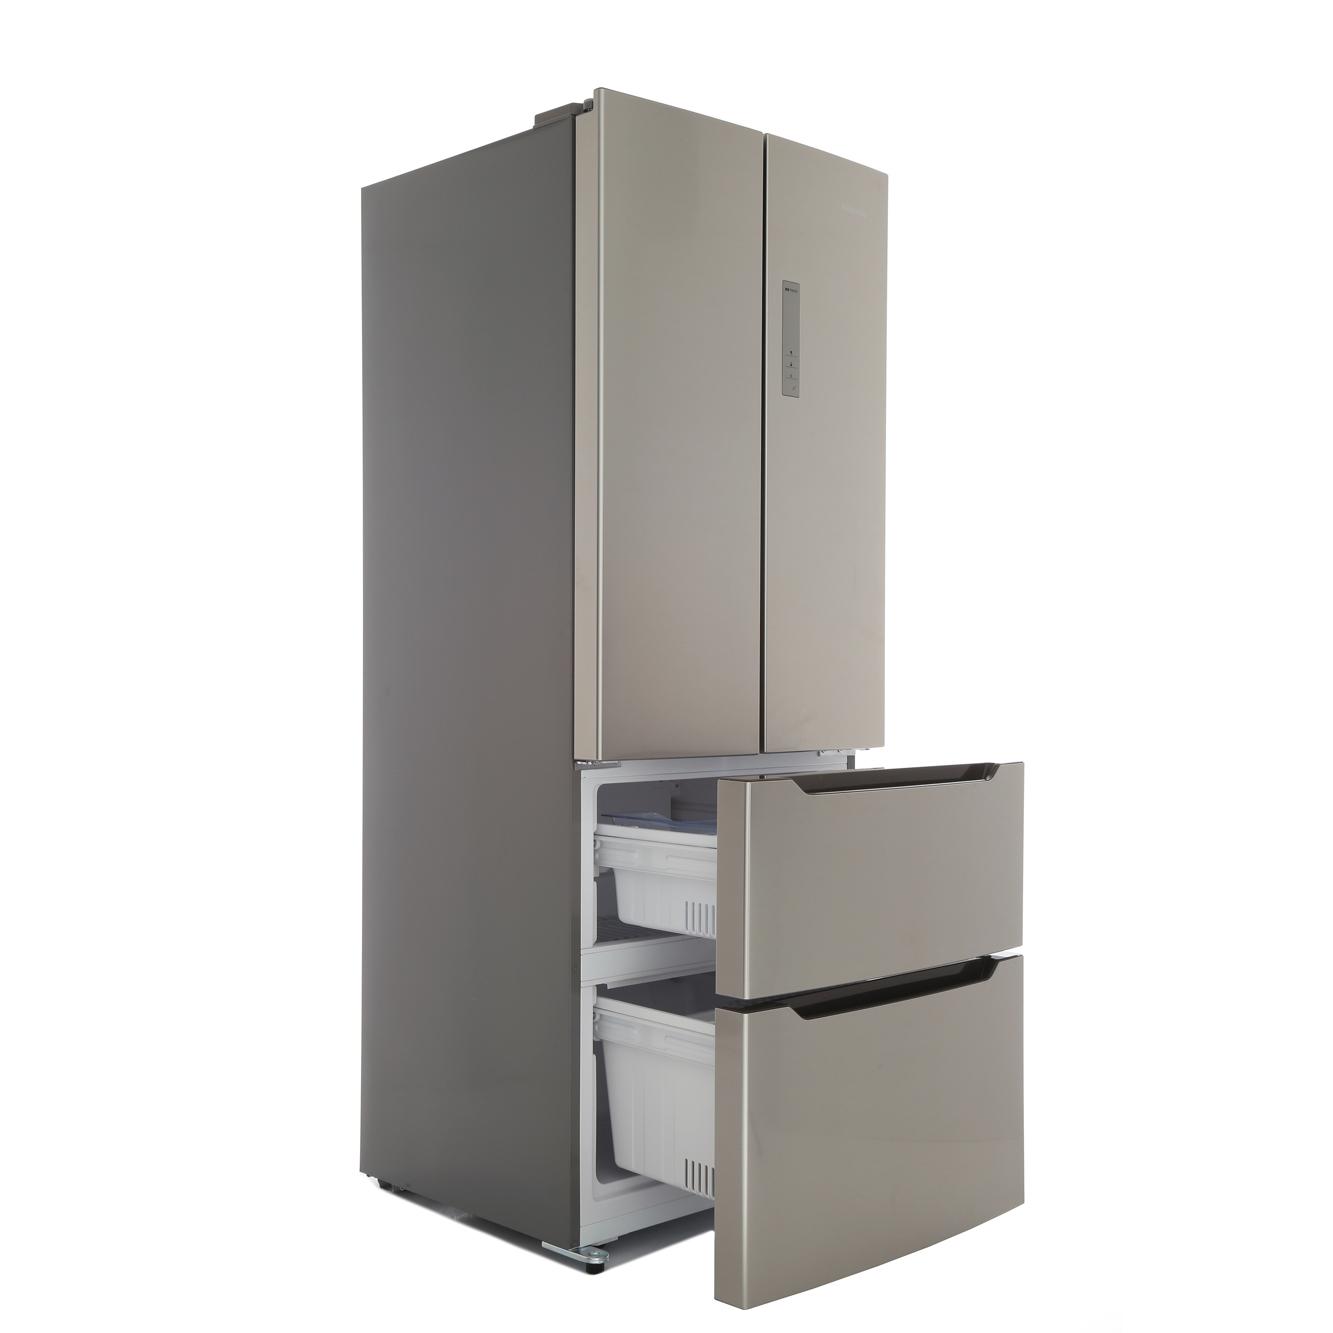 Buy Hisense Rf528n4ac1 American Fridge Freezer Grey